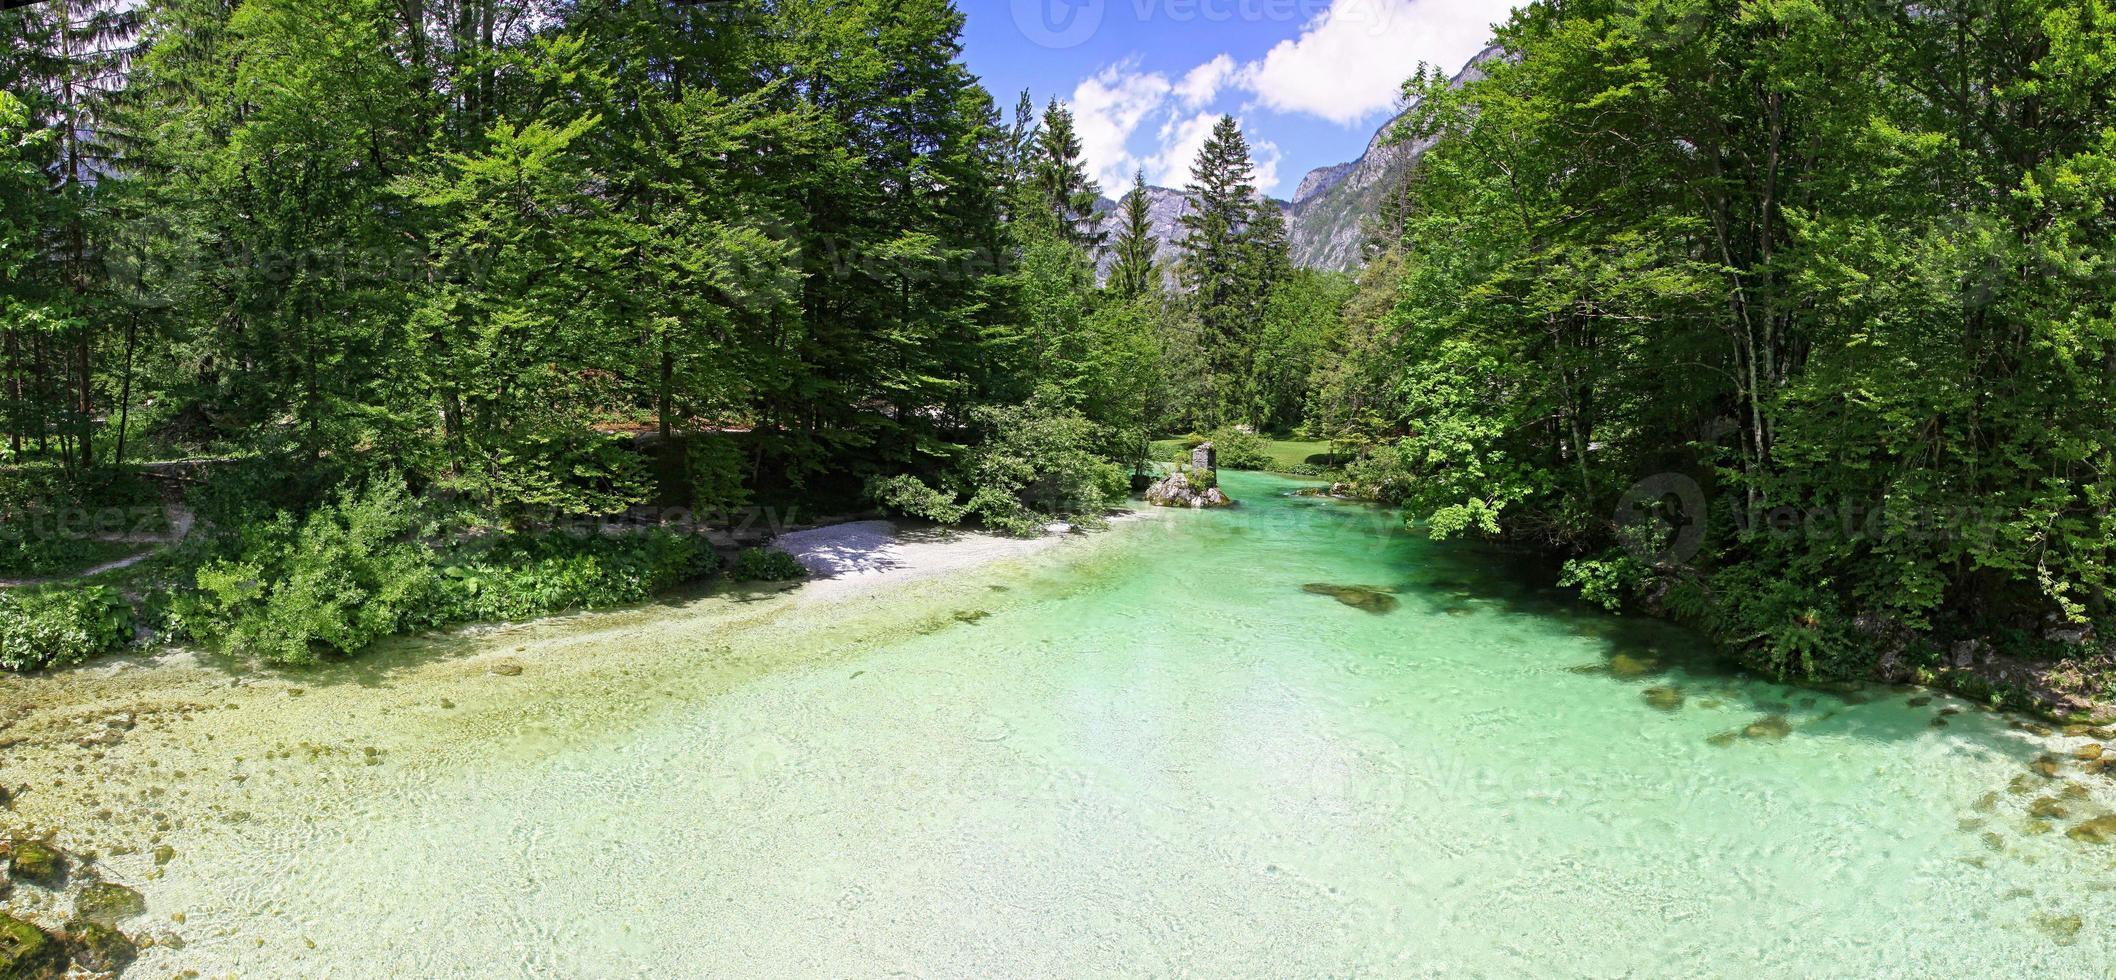 sava bohinjka rivier in julian alpen, slovenië foto